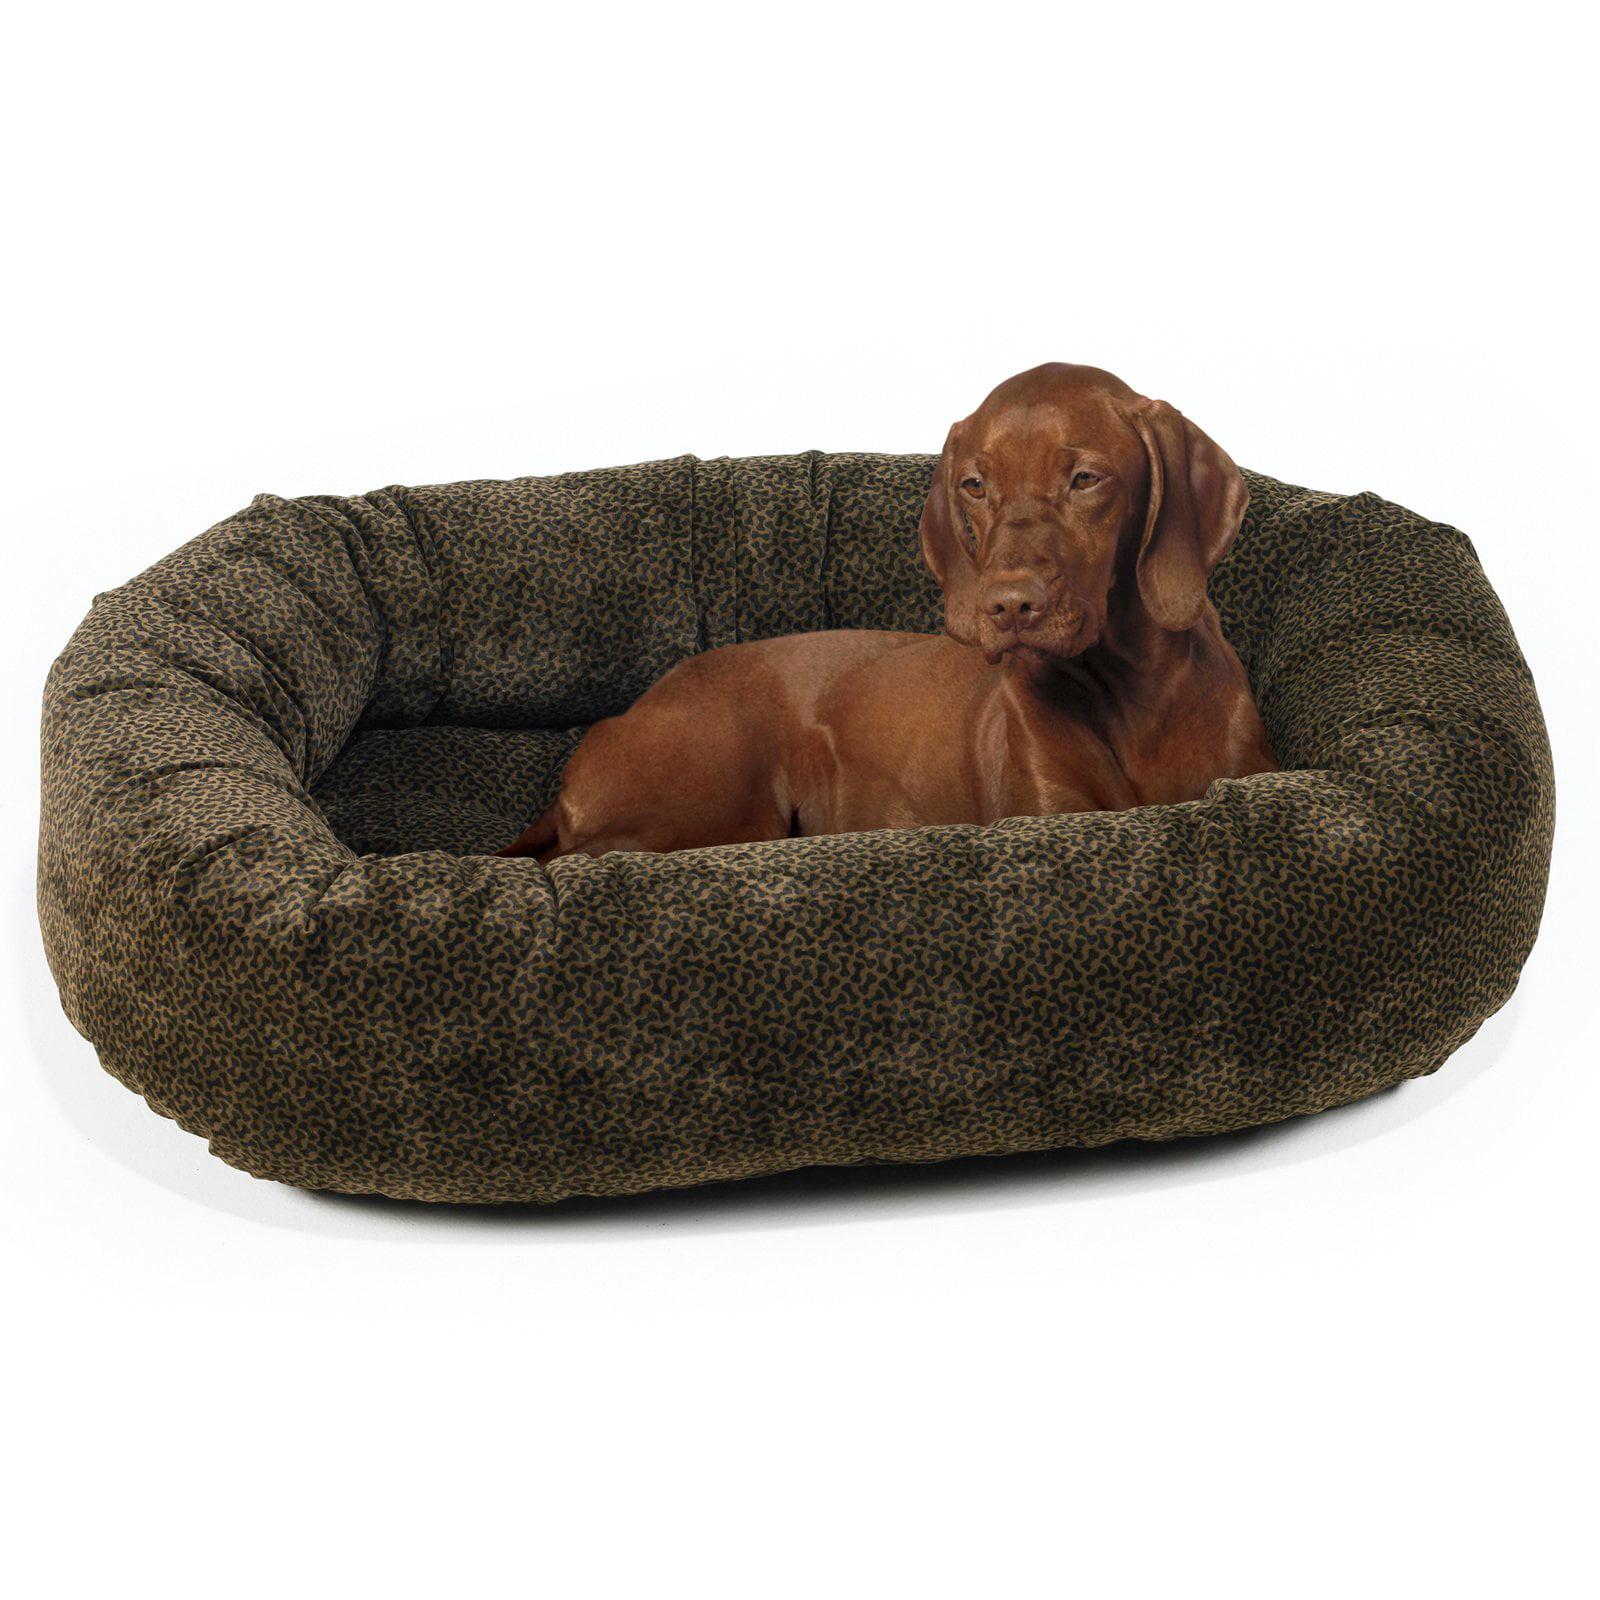 Bowsers Diamond Series Microvelvet Donut Dog Bed